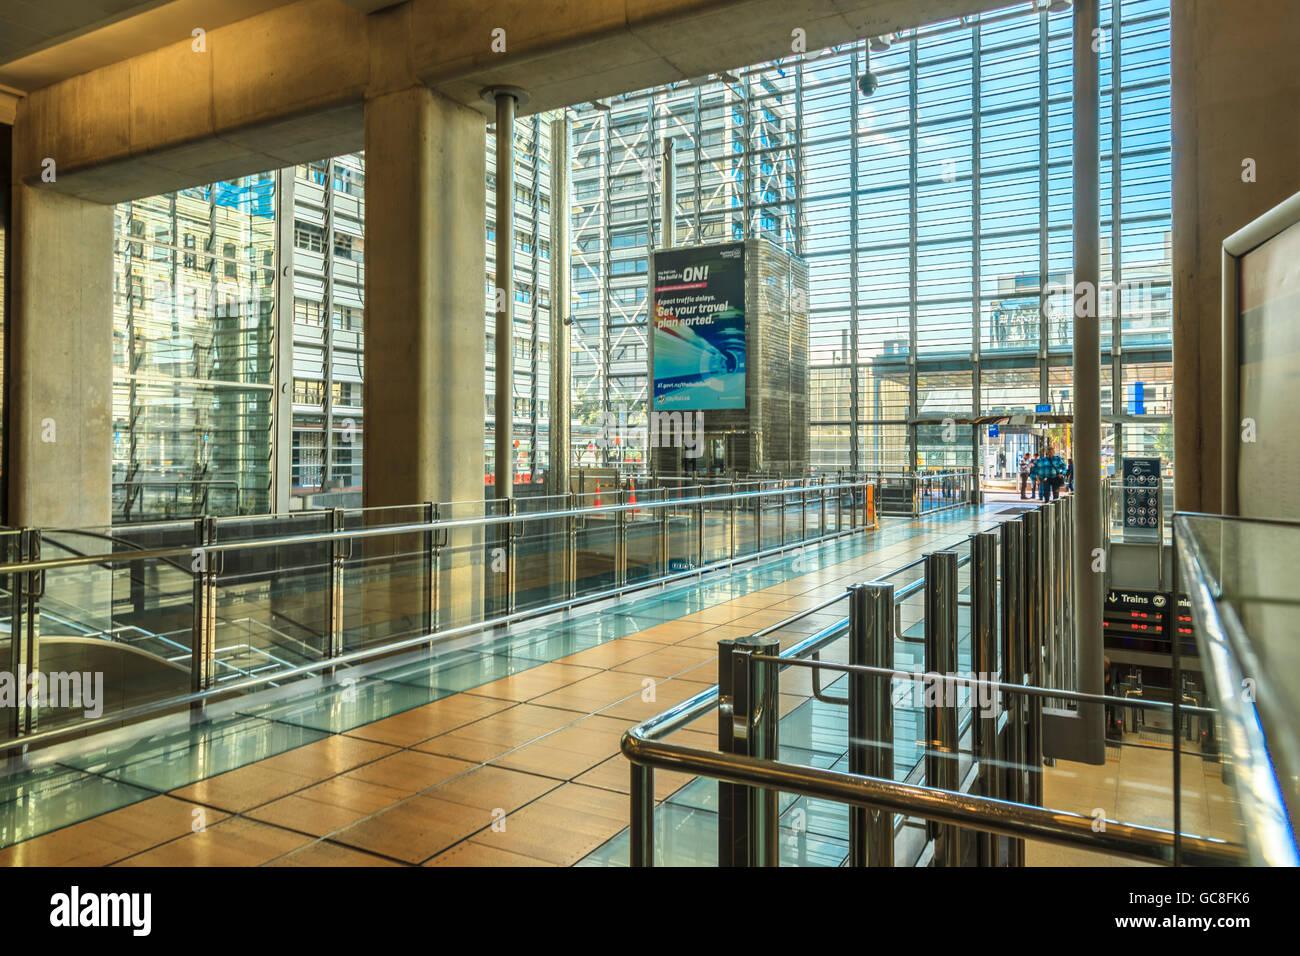 Britomart Transport Centre, interior showing glass facade , Auckland CBD, North Island, New Zealand - Stock Image